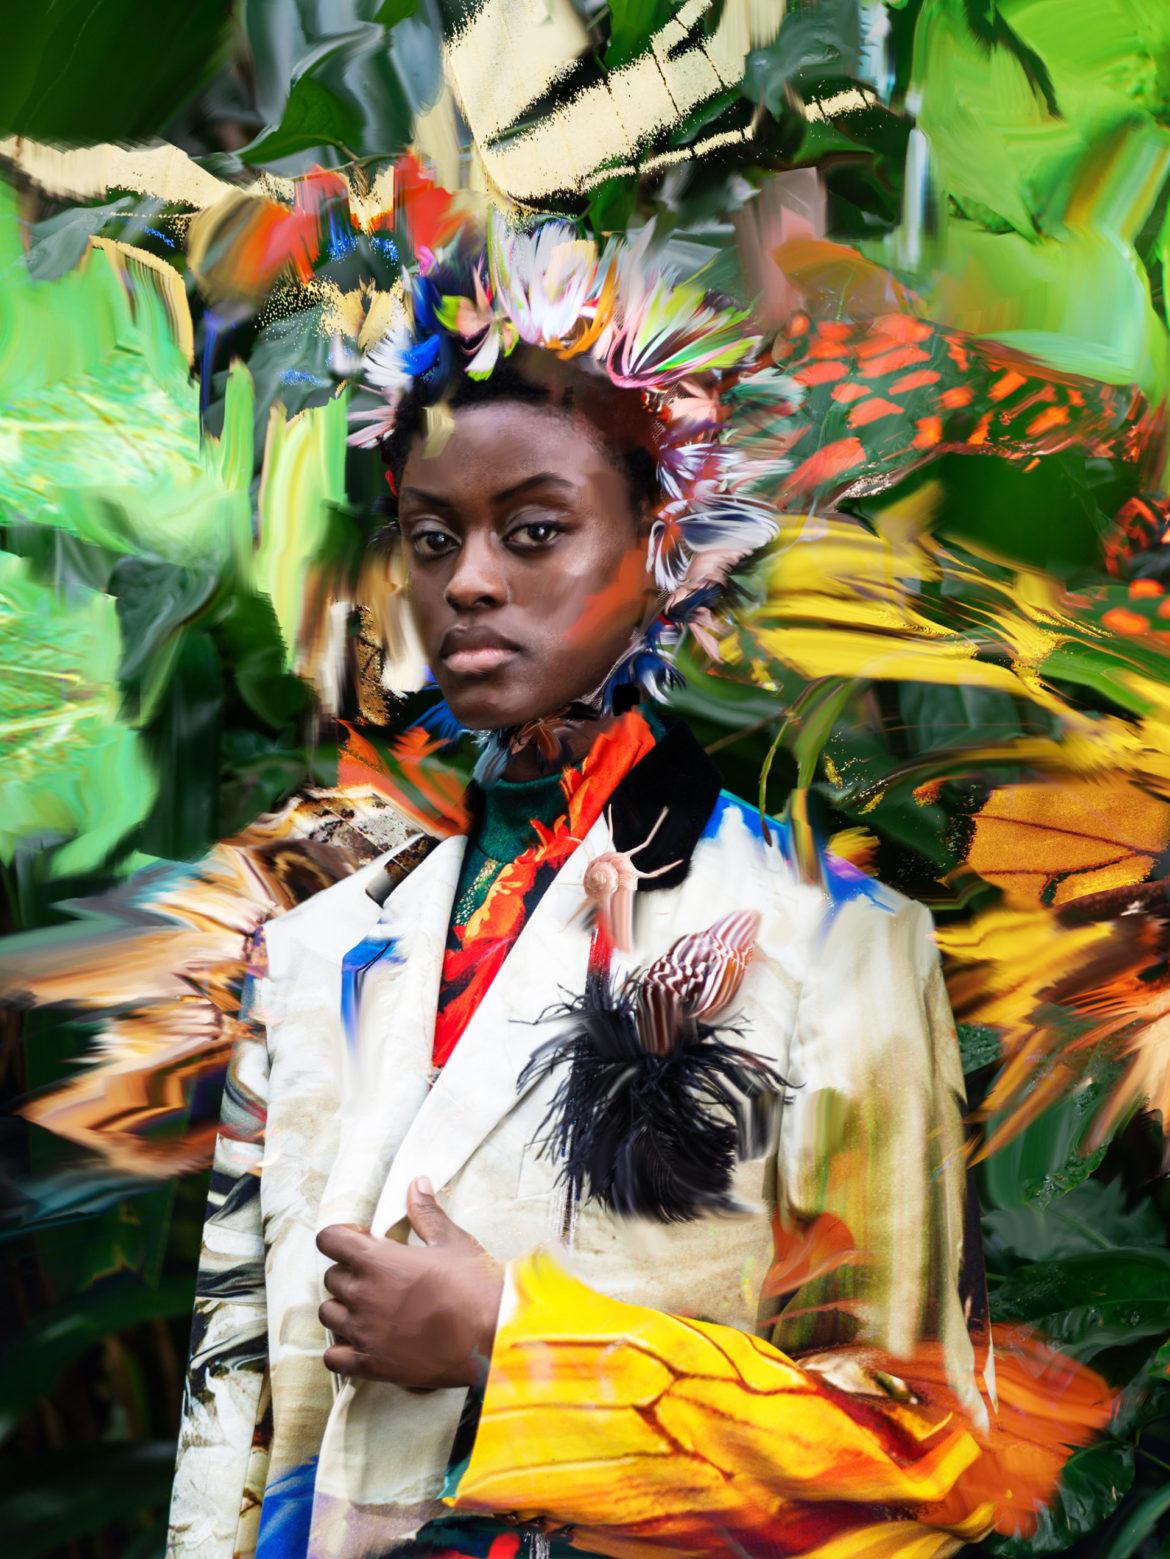 Rose Danford Philips collection by Eliska Sky